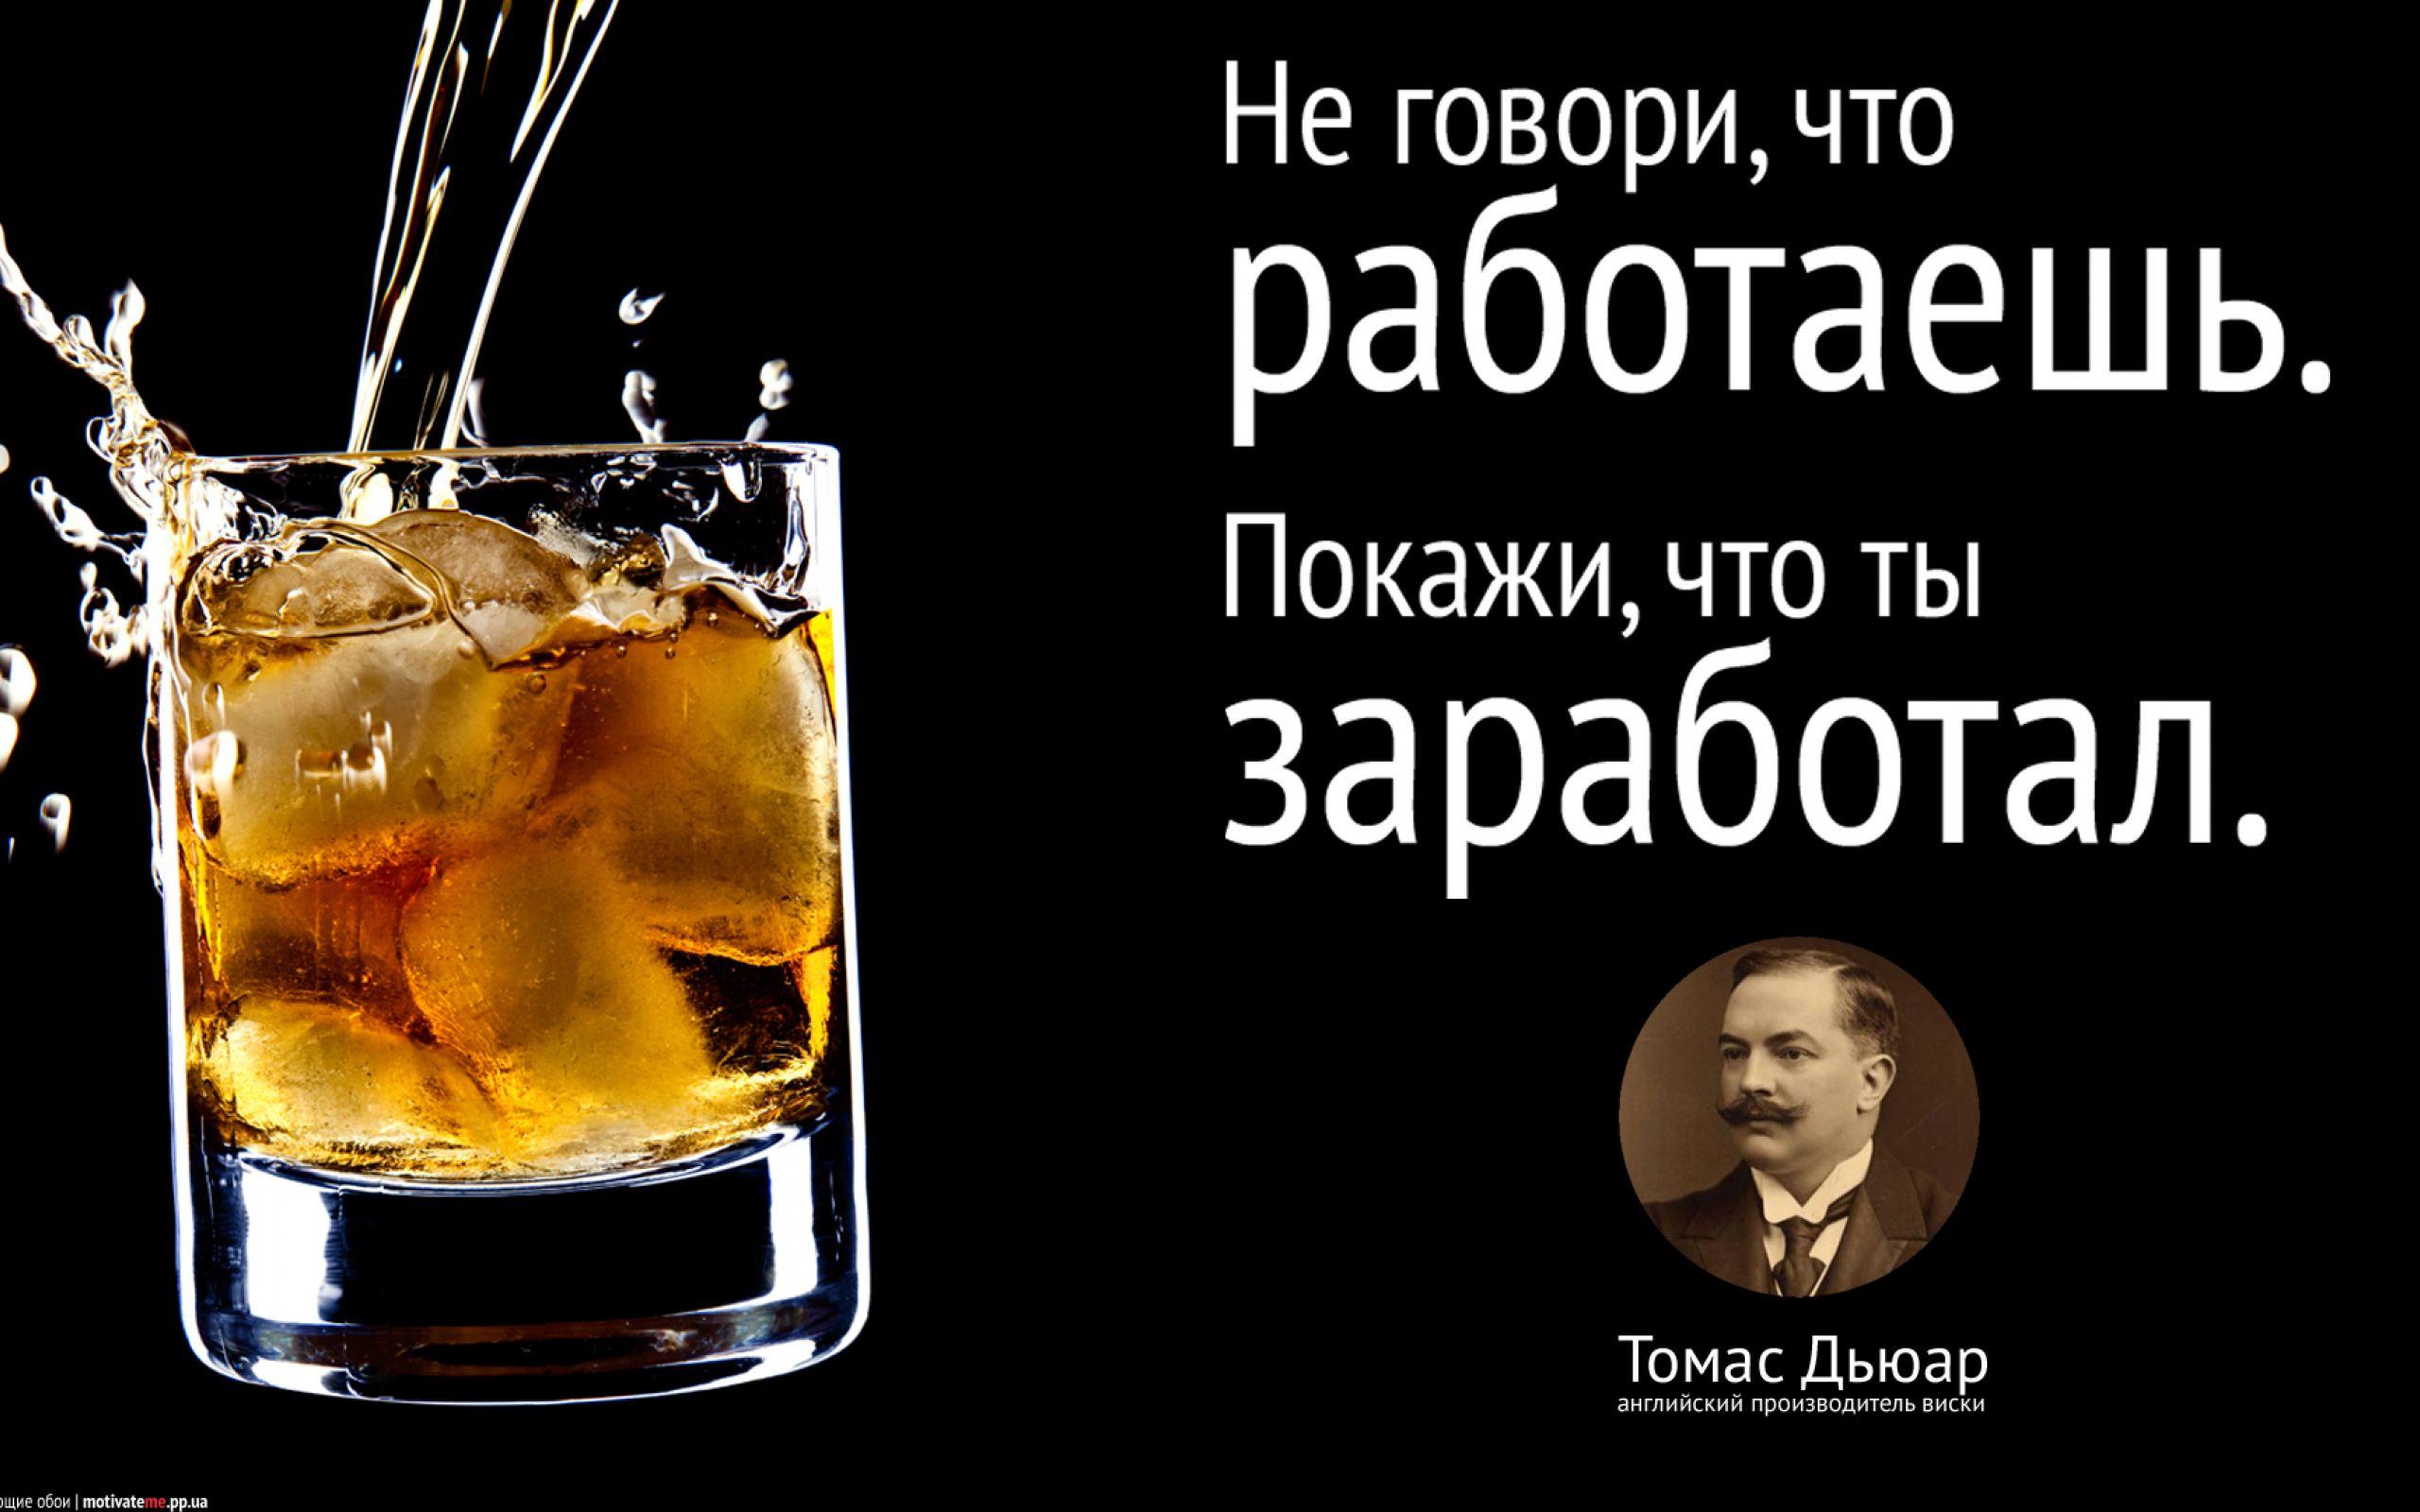 http://www.bgpics.ru/pictures/2560x1600/8391-dengi-motivaciya-oboi-2560x1600.jpg